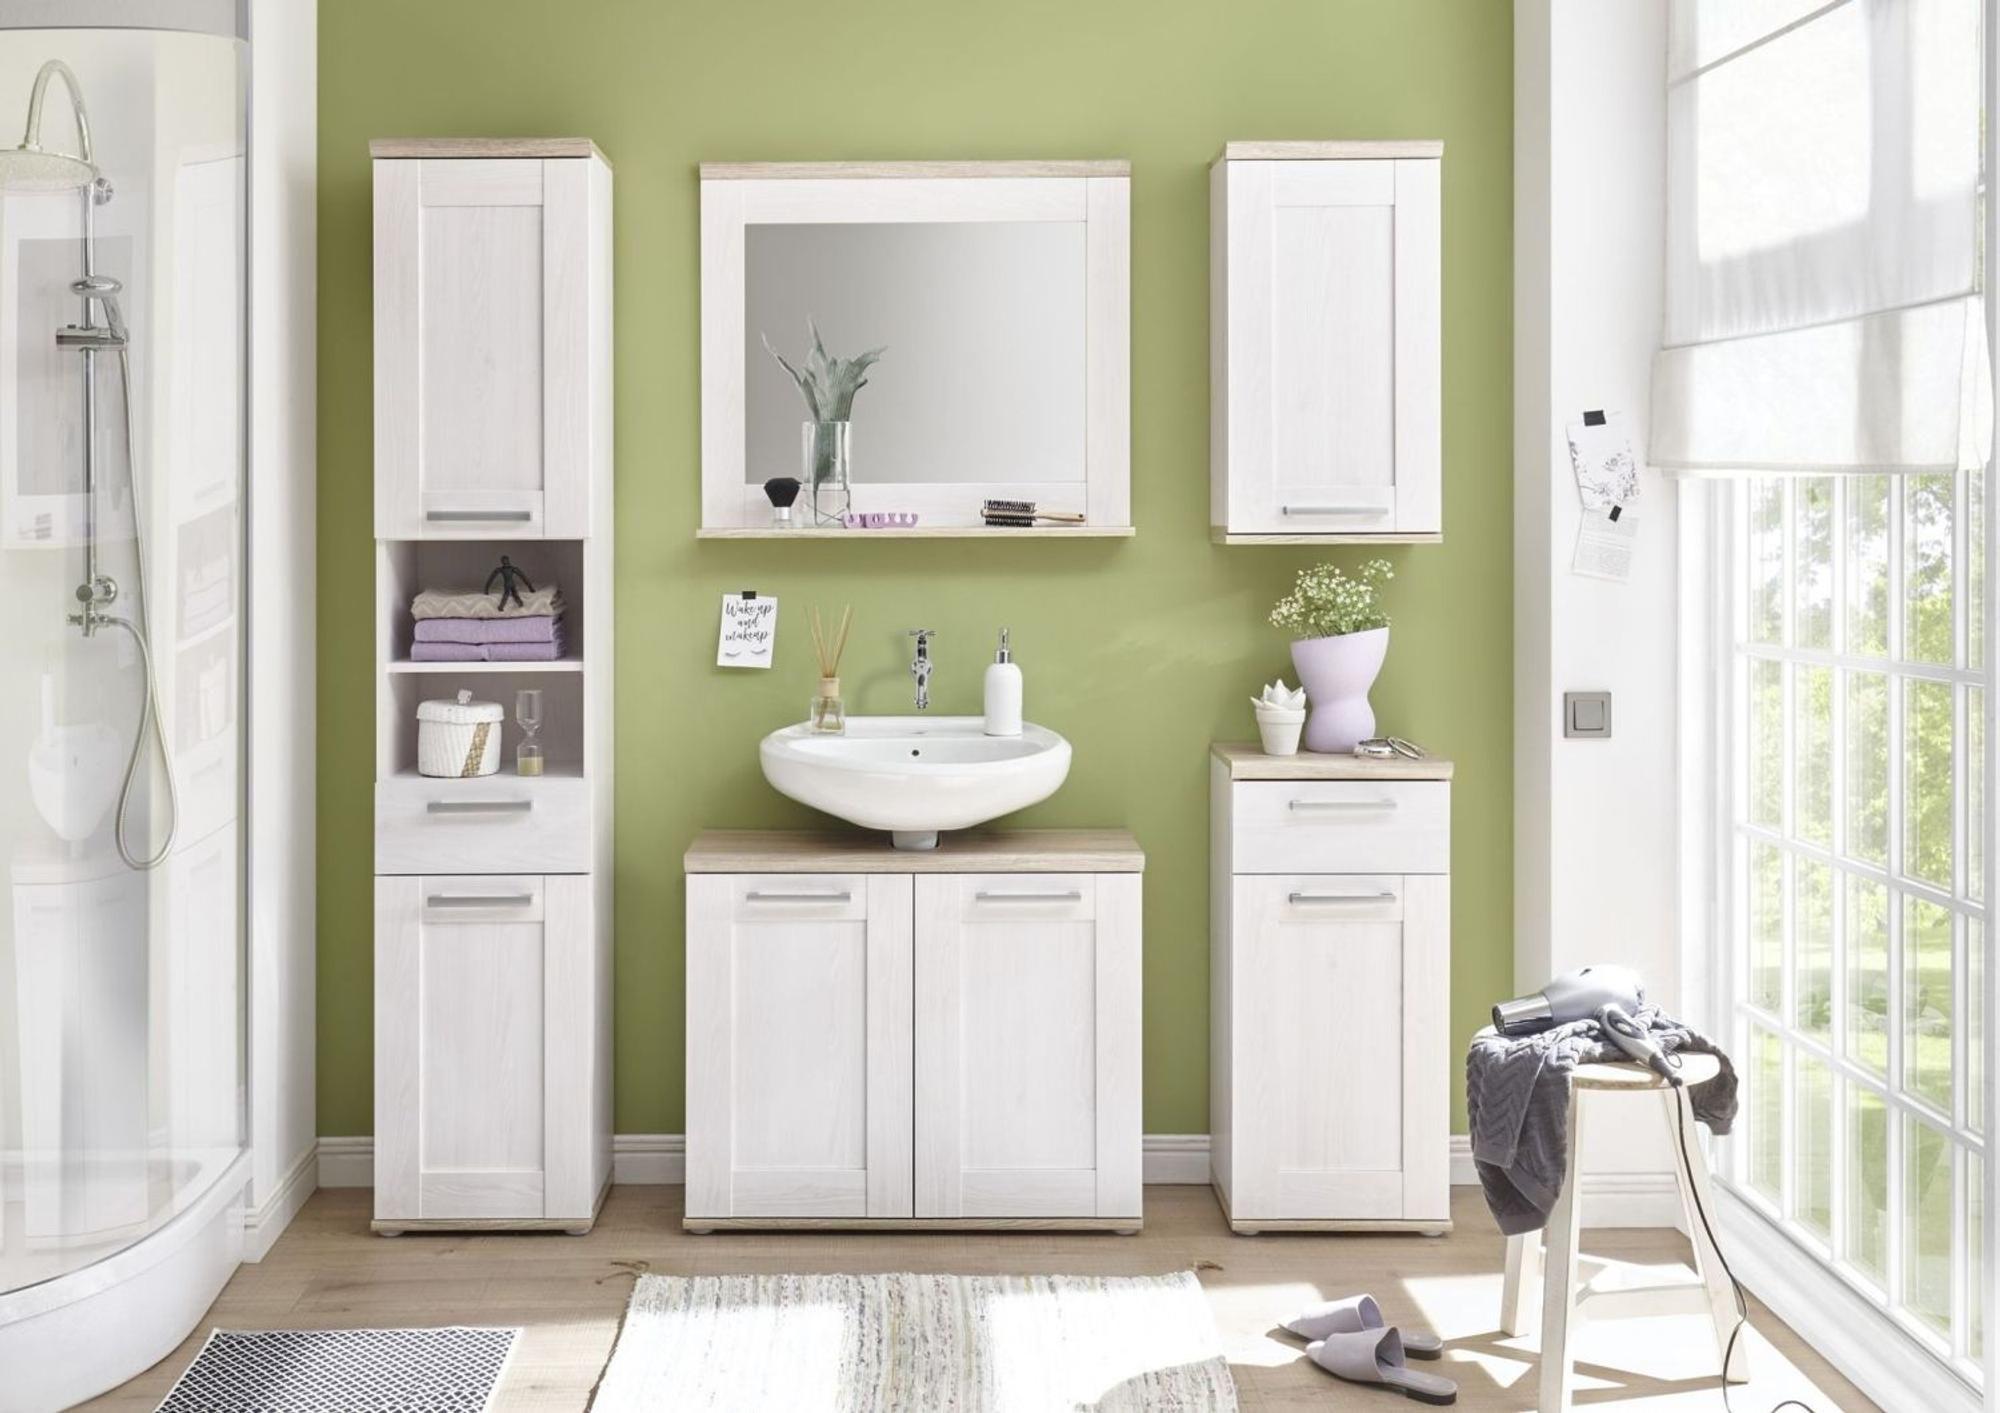 Waschbeckenunterschrank Romina Bei Opti Wohnwelt Entdecken In 2020 Waschbeckenunterschrank Badezimmer Badezimmer Mobel